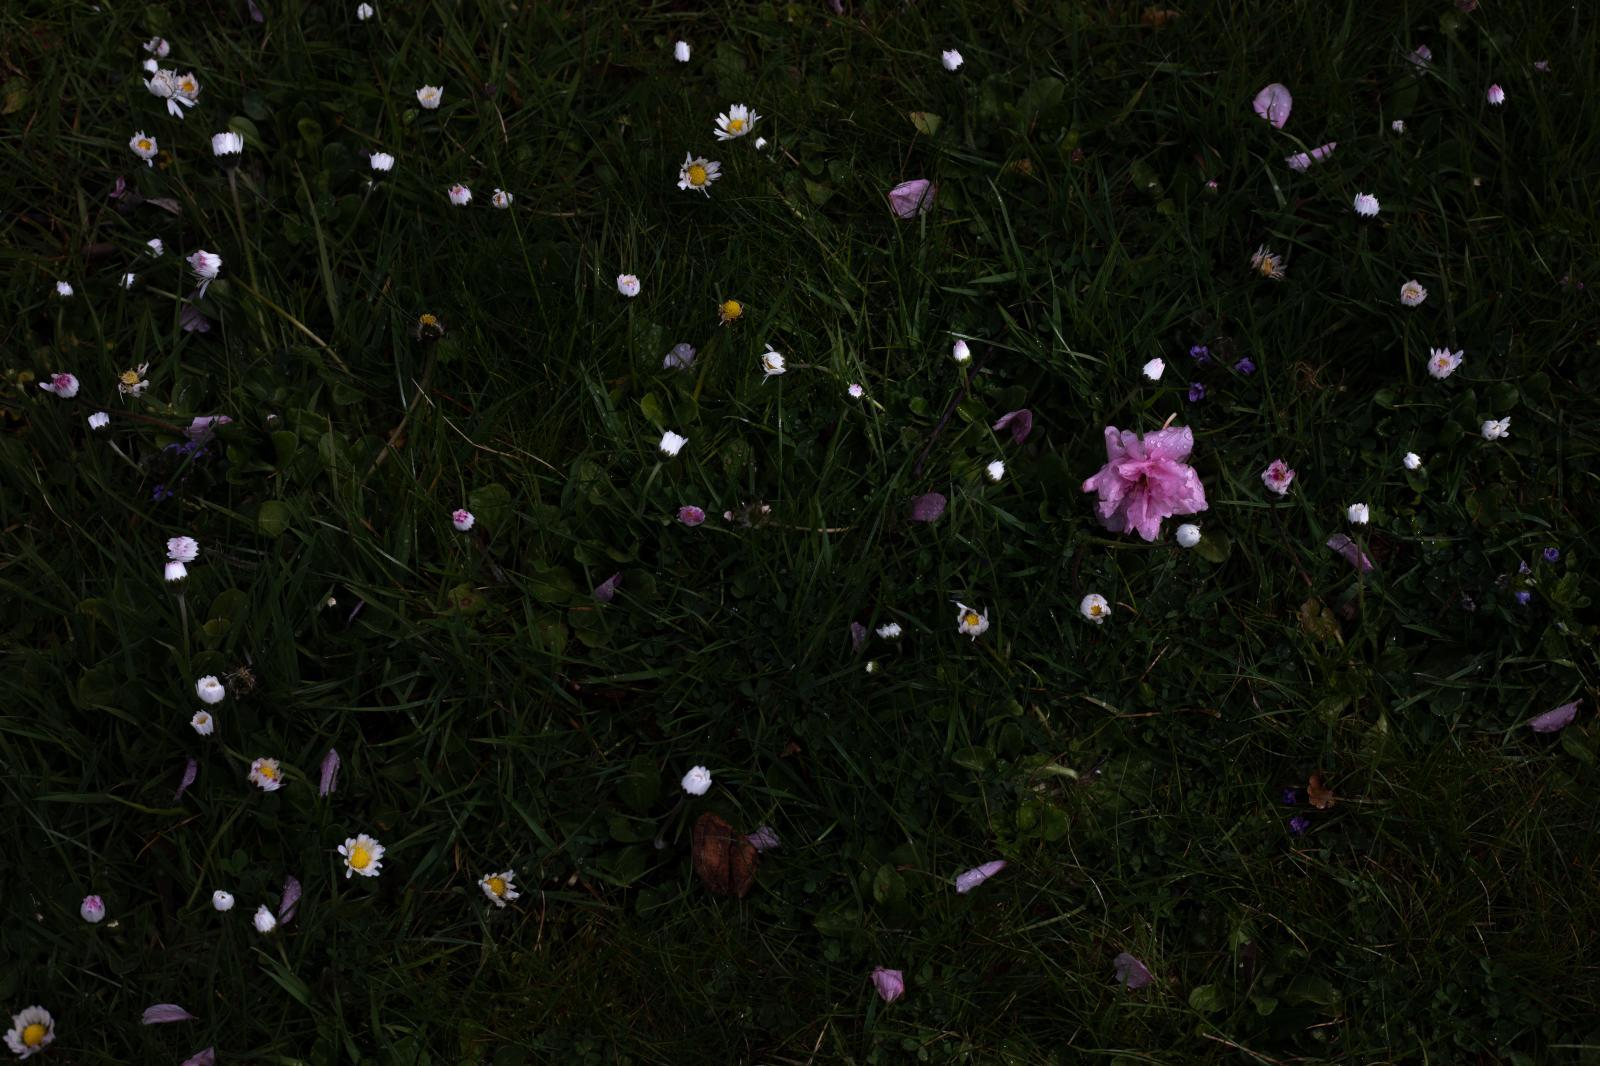 Photography image - Loading STischendorf_In_Quarantine_Alone_Day2.jpg